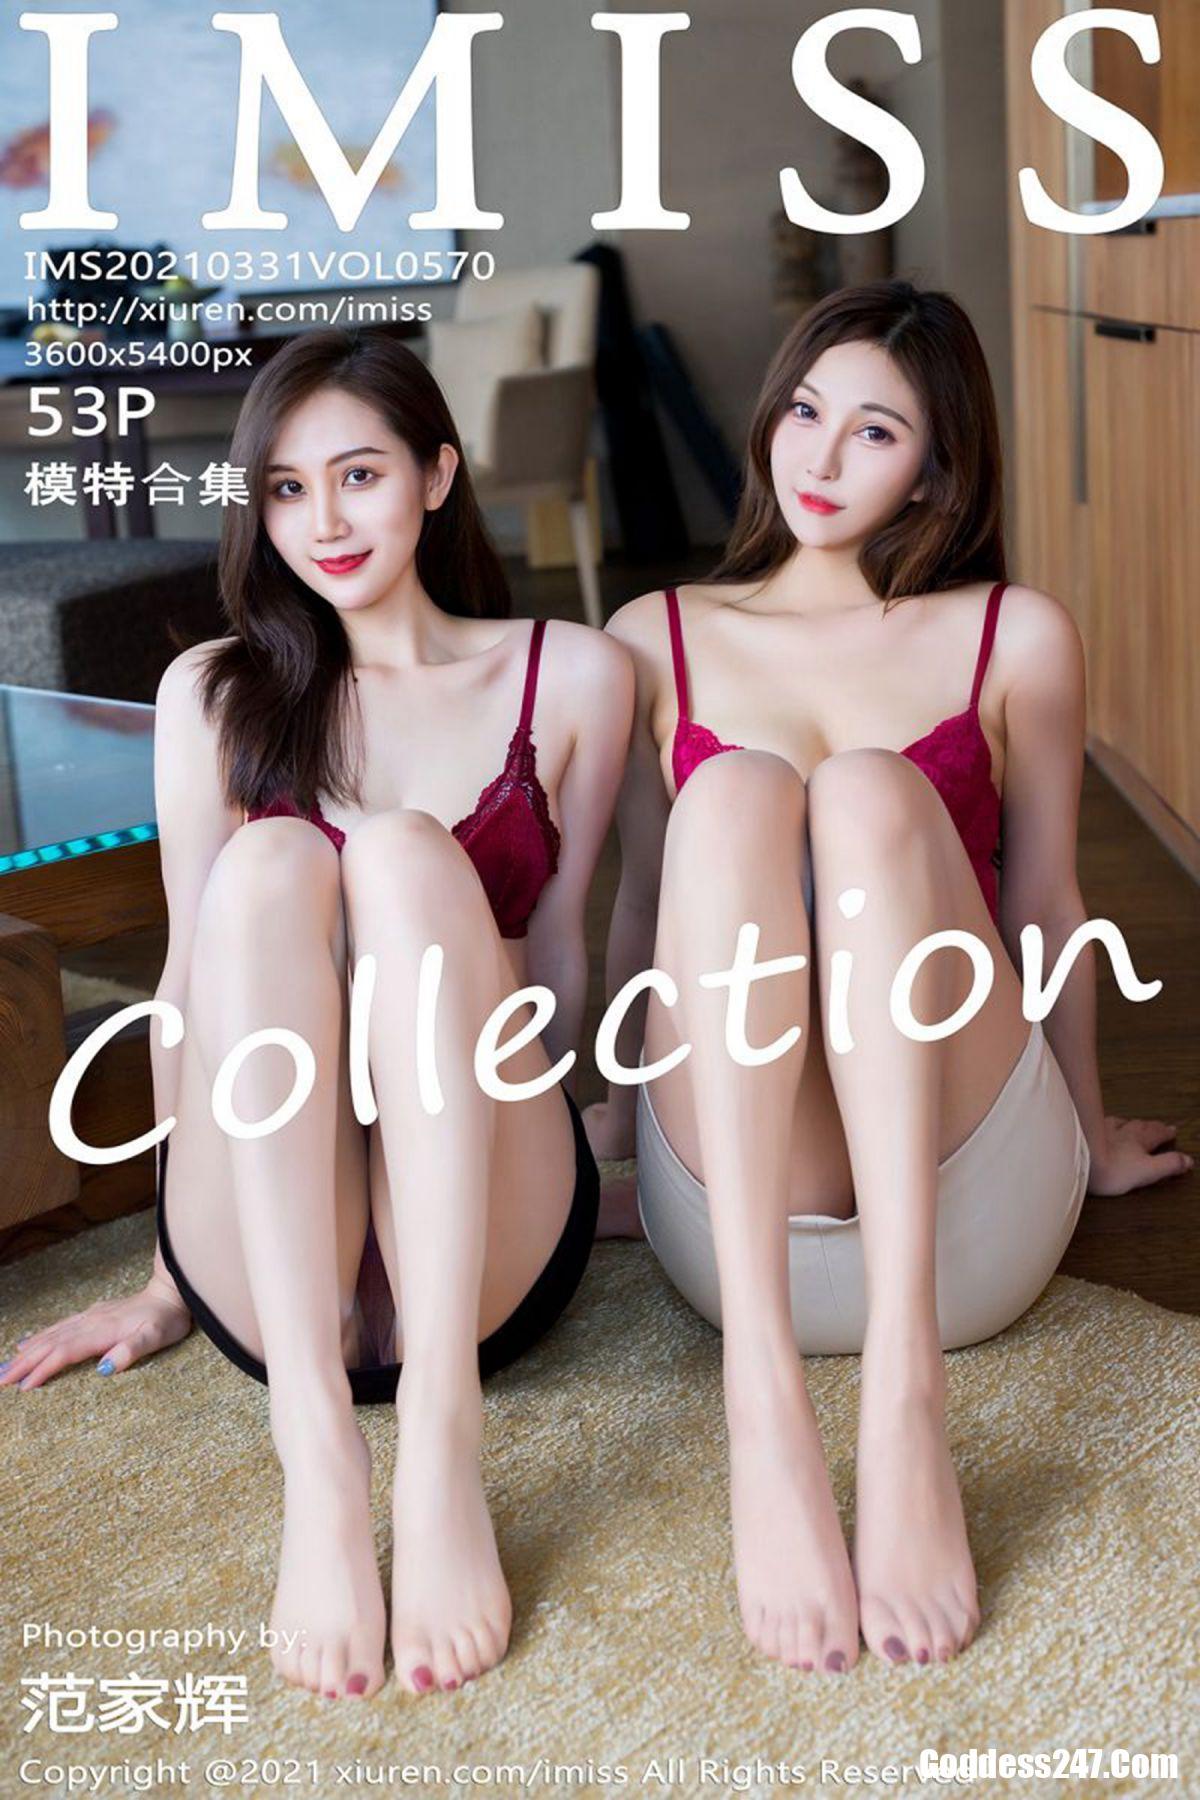 IMiss爱蜜社 Vol.570 Lavinia肉肉